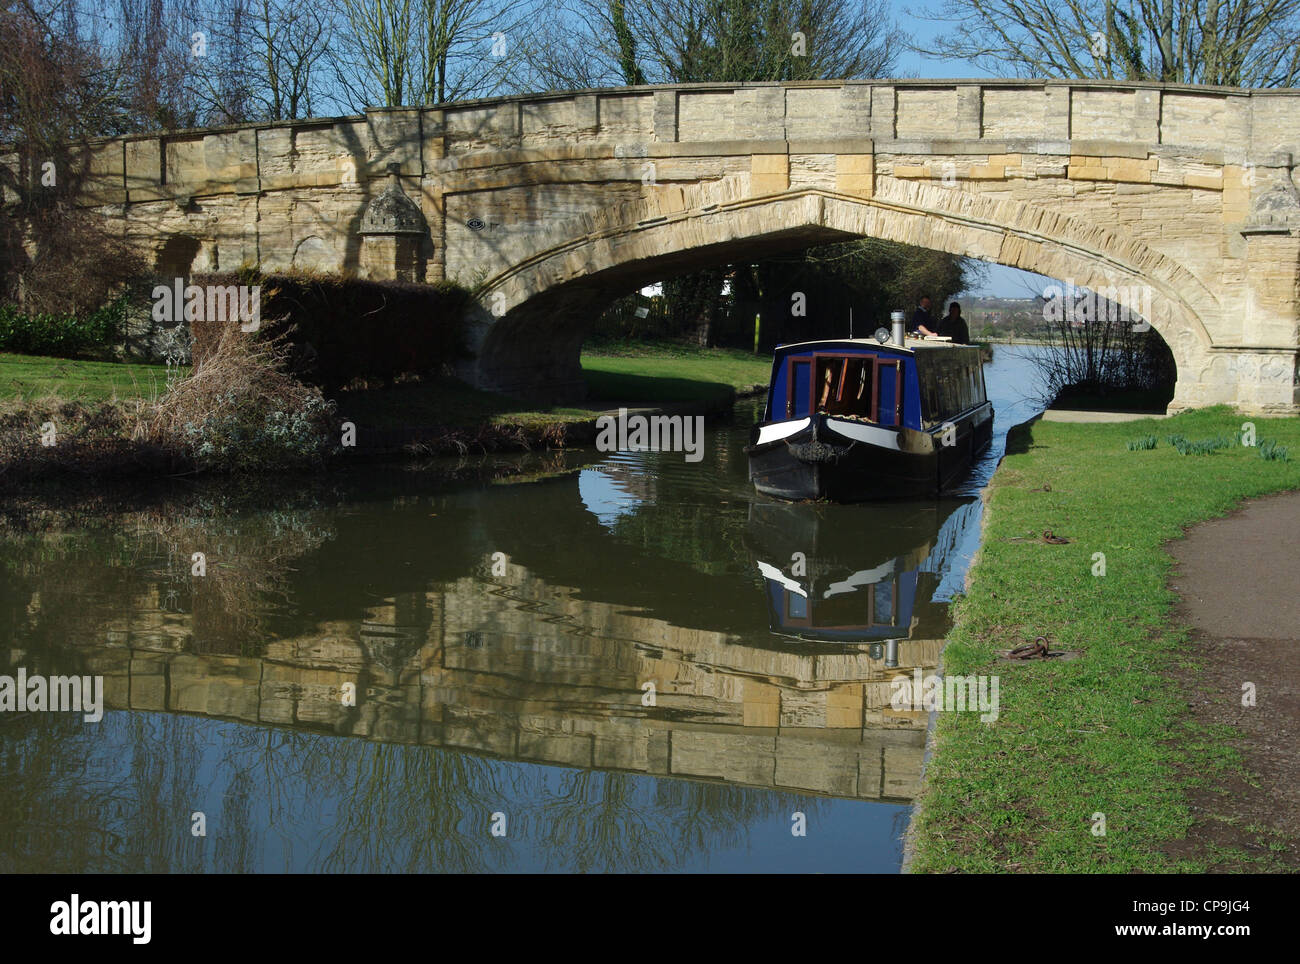 Narrowboat sailing under Solomon's Bridge at Cosgrove. - Stock Image